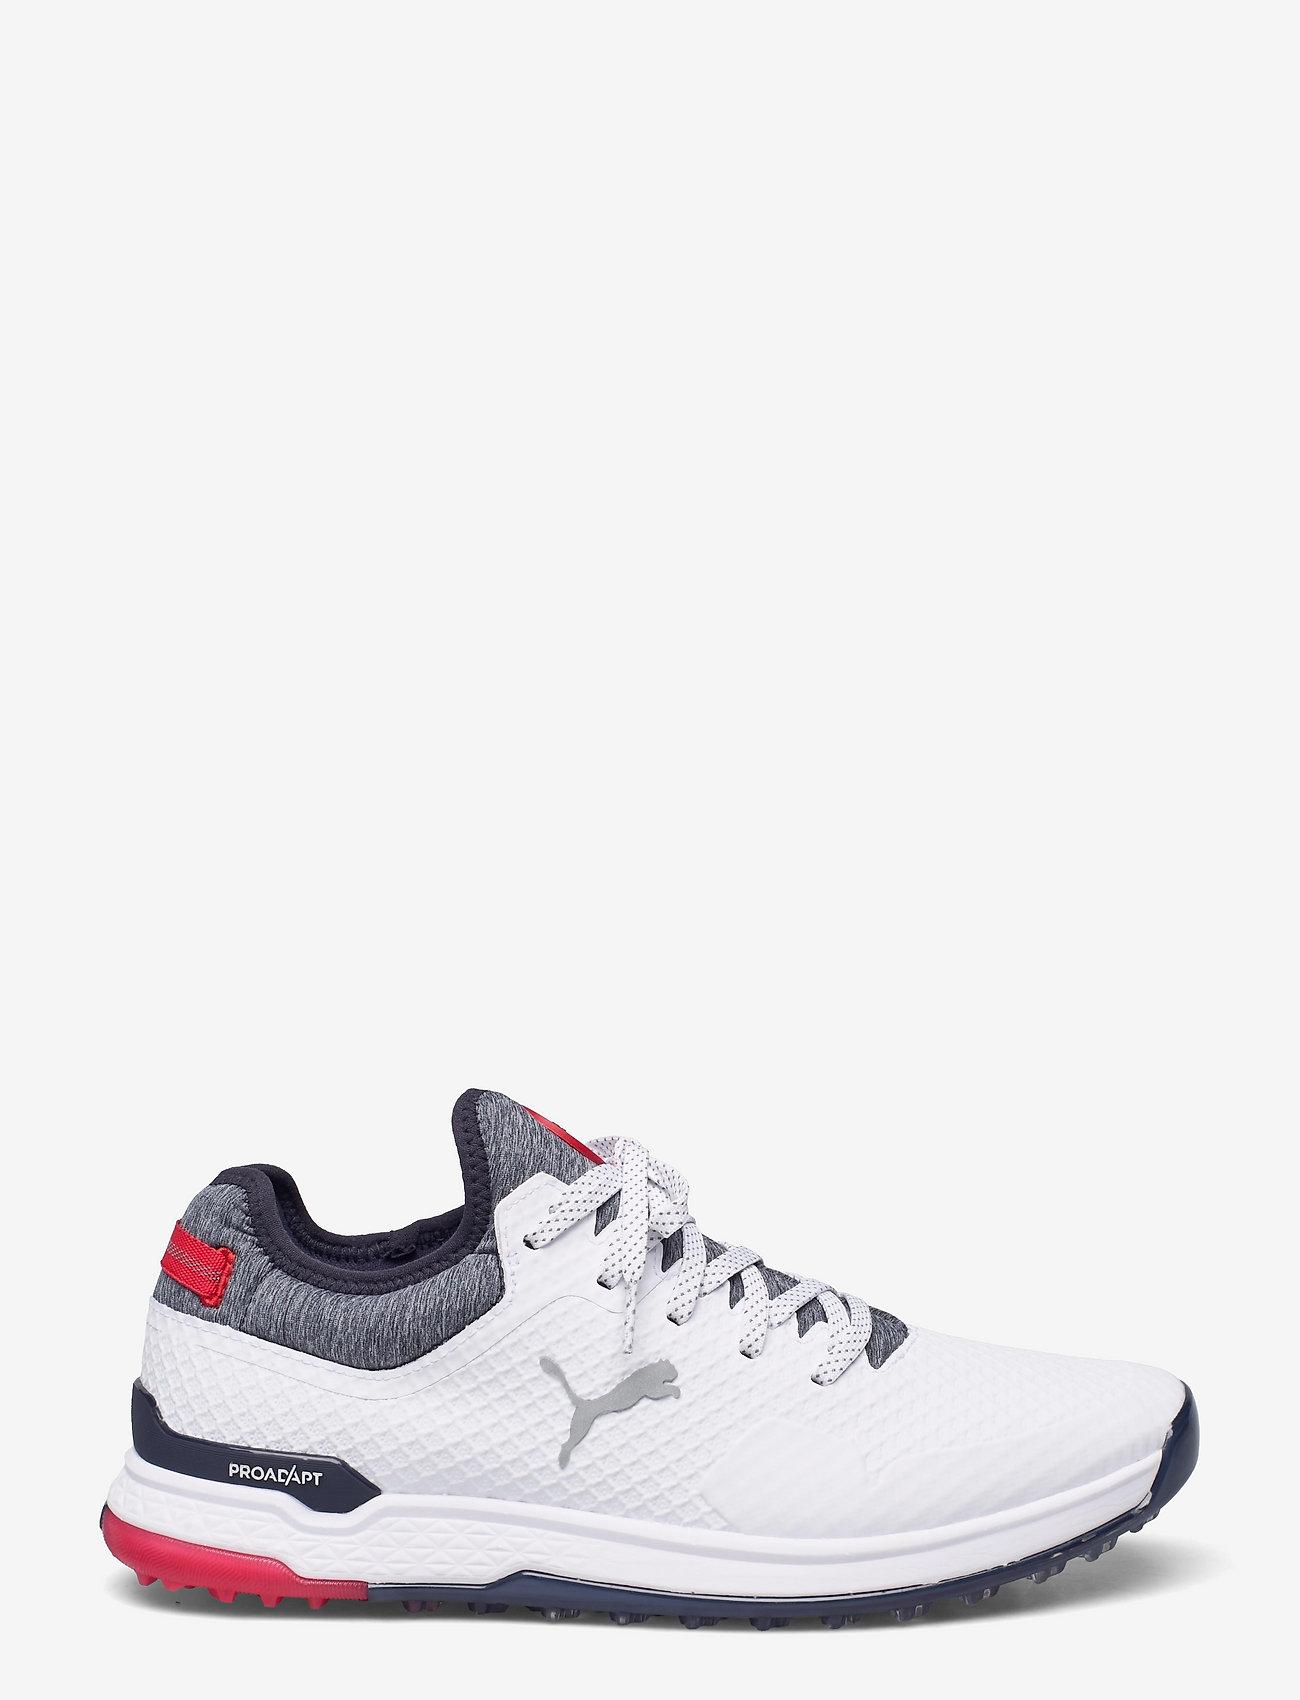 PUMA Golf - PROADAPT ALPHACAT - golf shoes - puma white-navy blazer-high risk re - 1